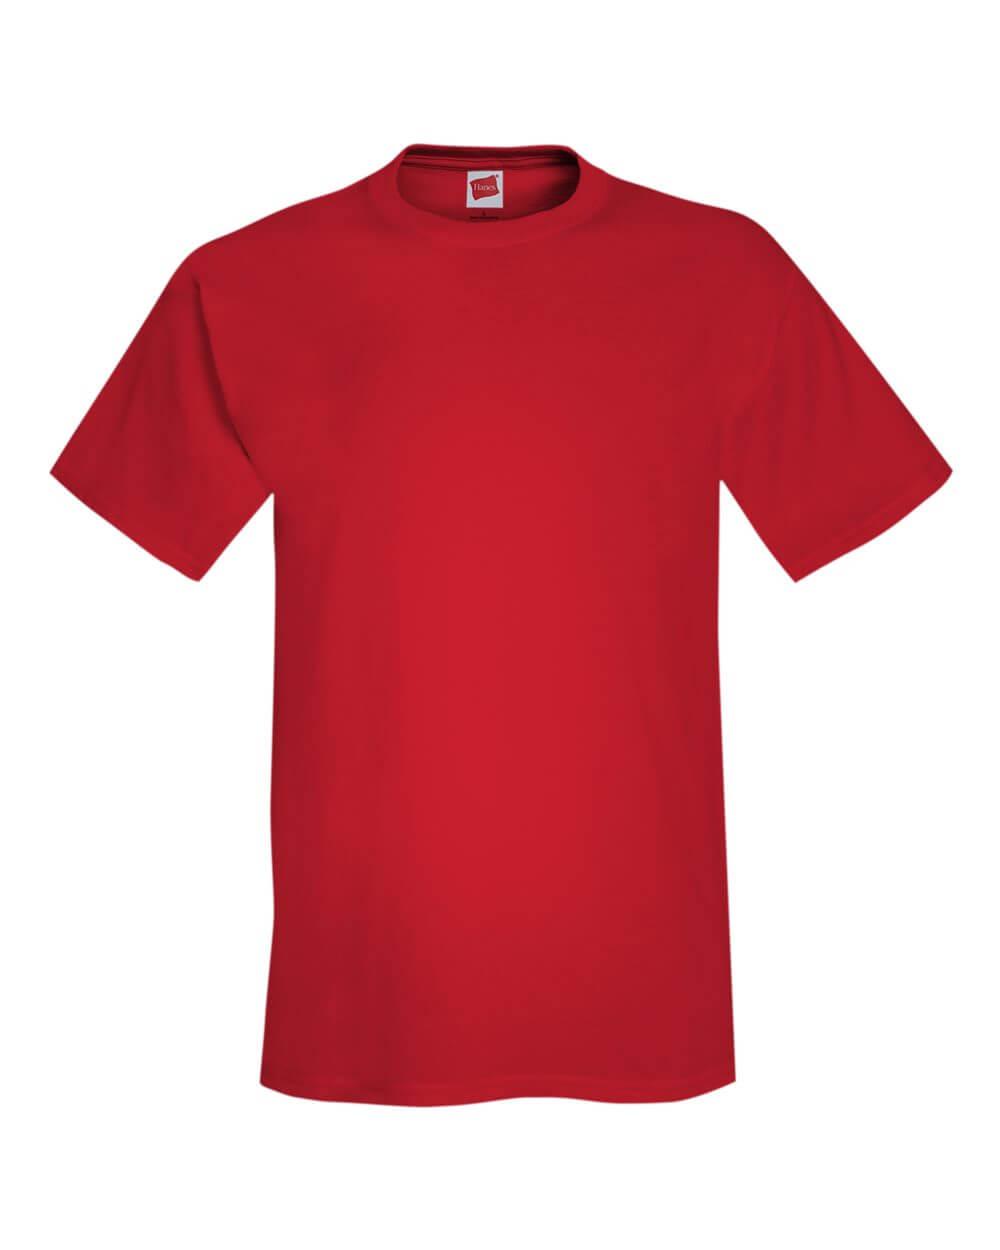 Hanes Comfortsoft Red Custom T Shirts